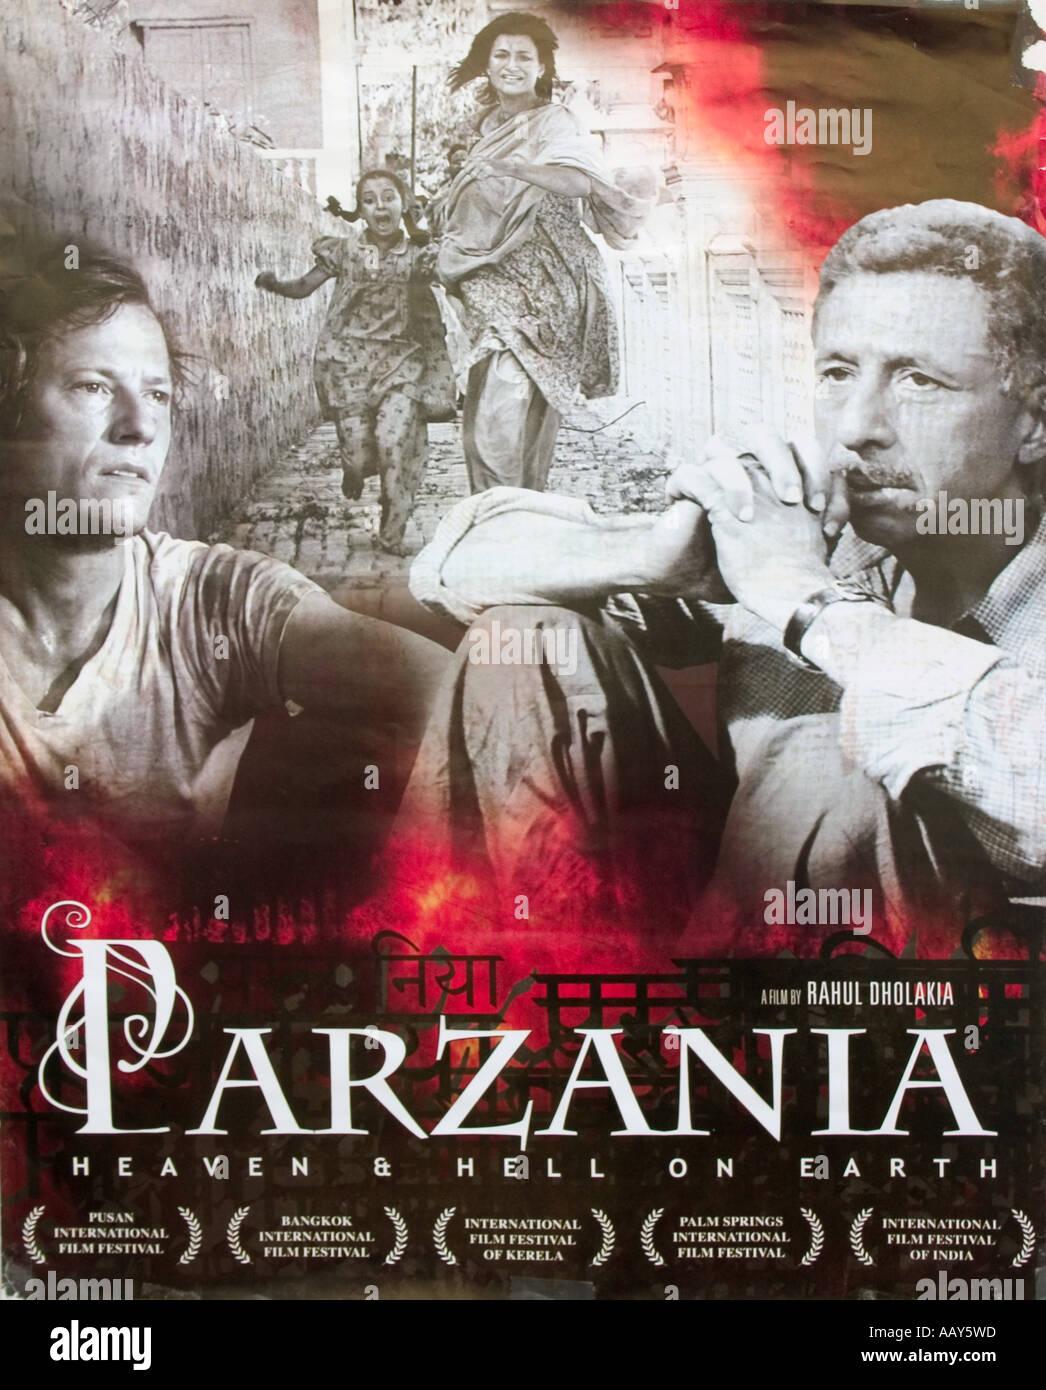 Amazon. Com: most controversial films, deepa mehta films 3dvds set.